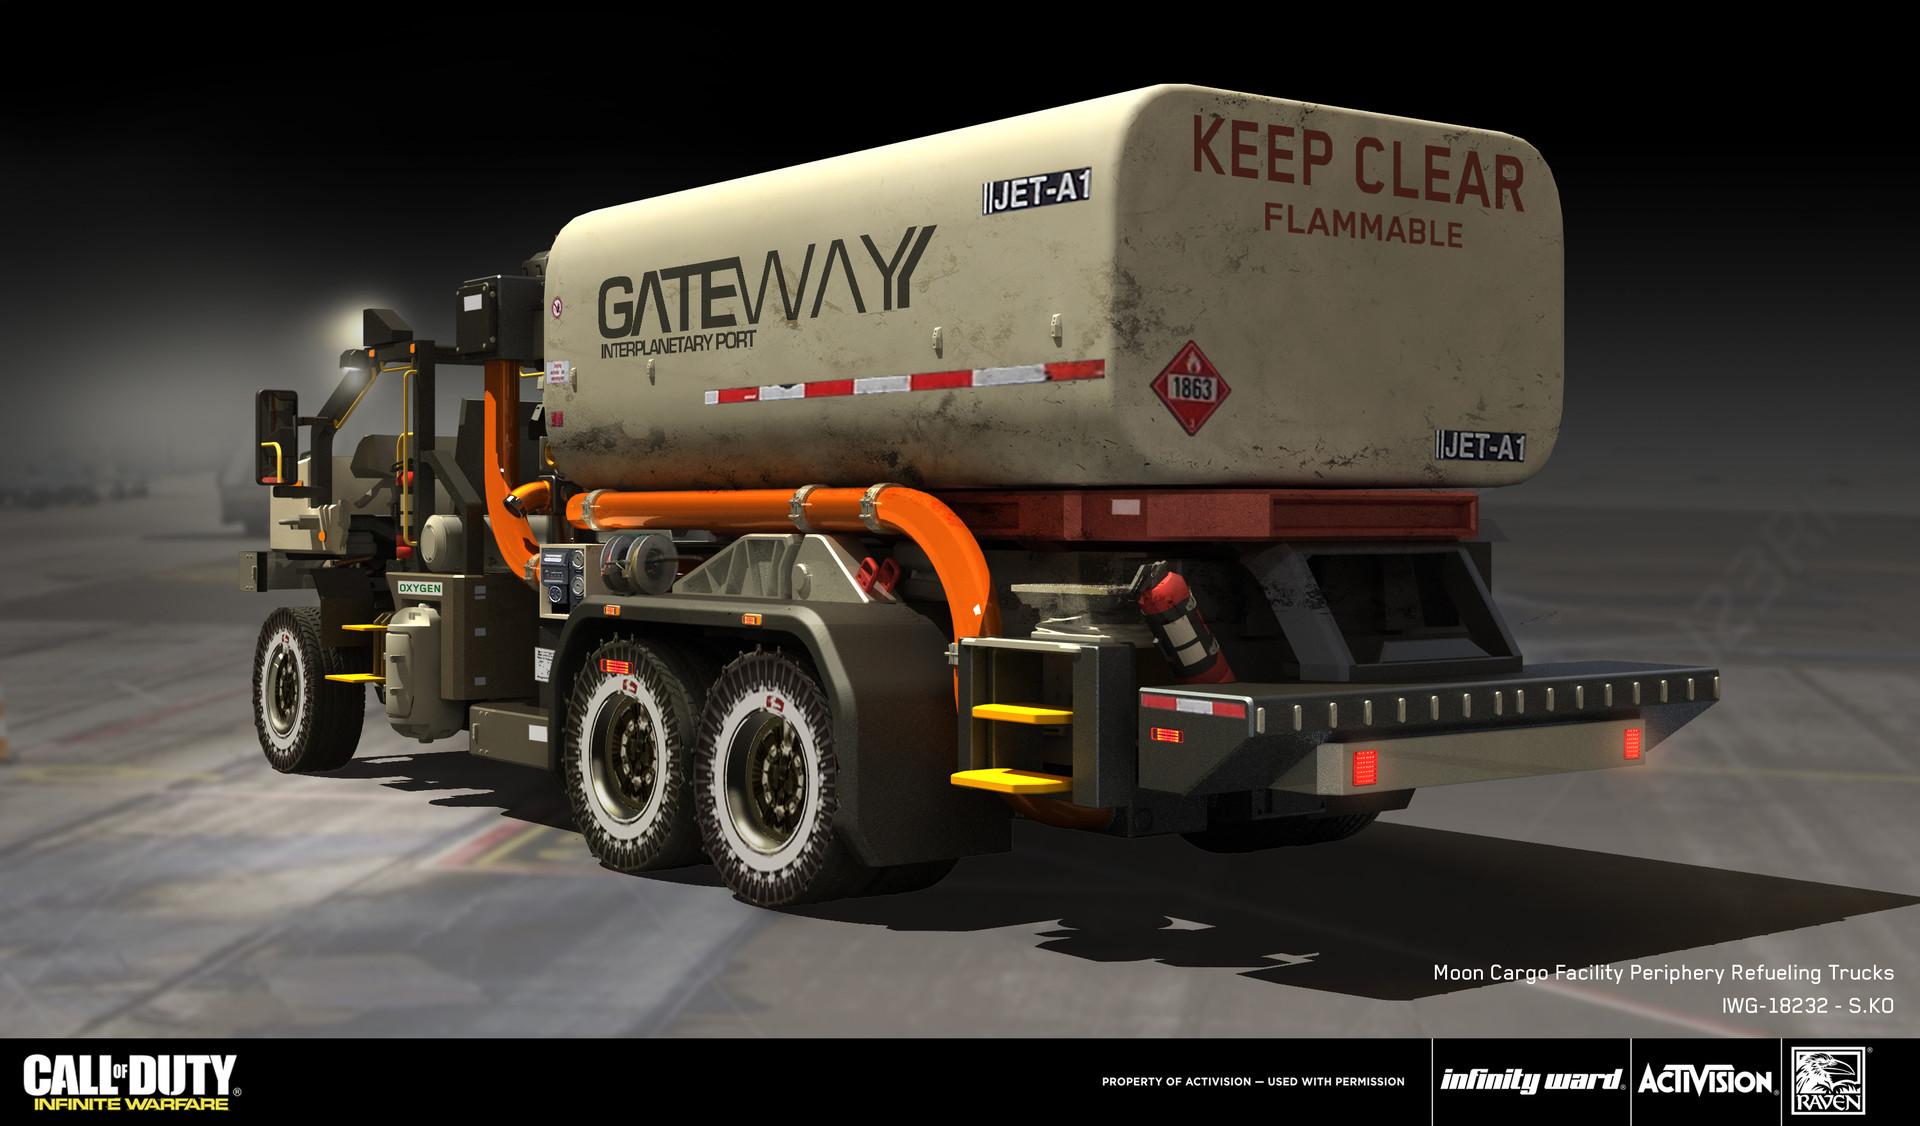 Simon ko veh sko iw7 01 06 16 refueling truck rear